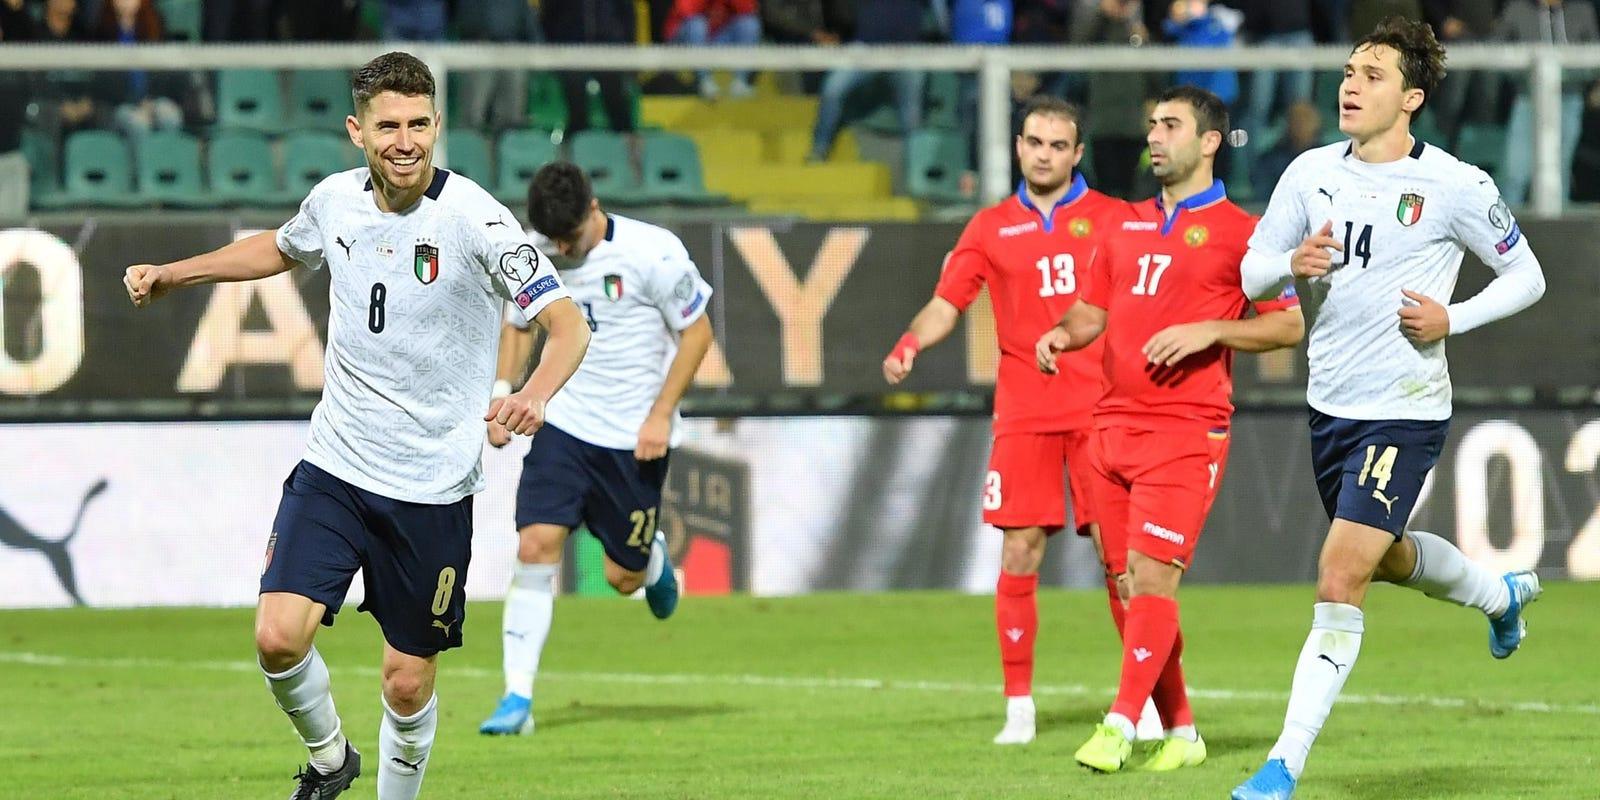 Italy armenia betting preview nfl csgobetting small